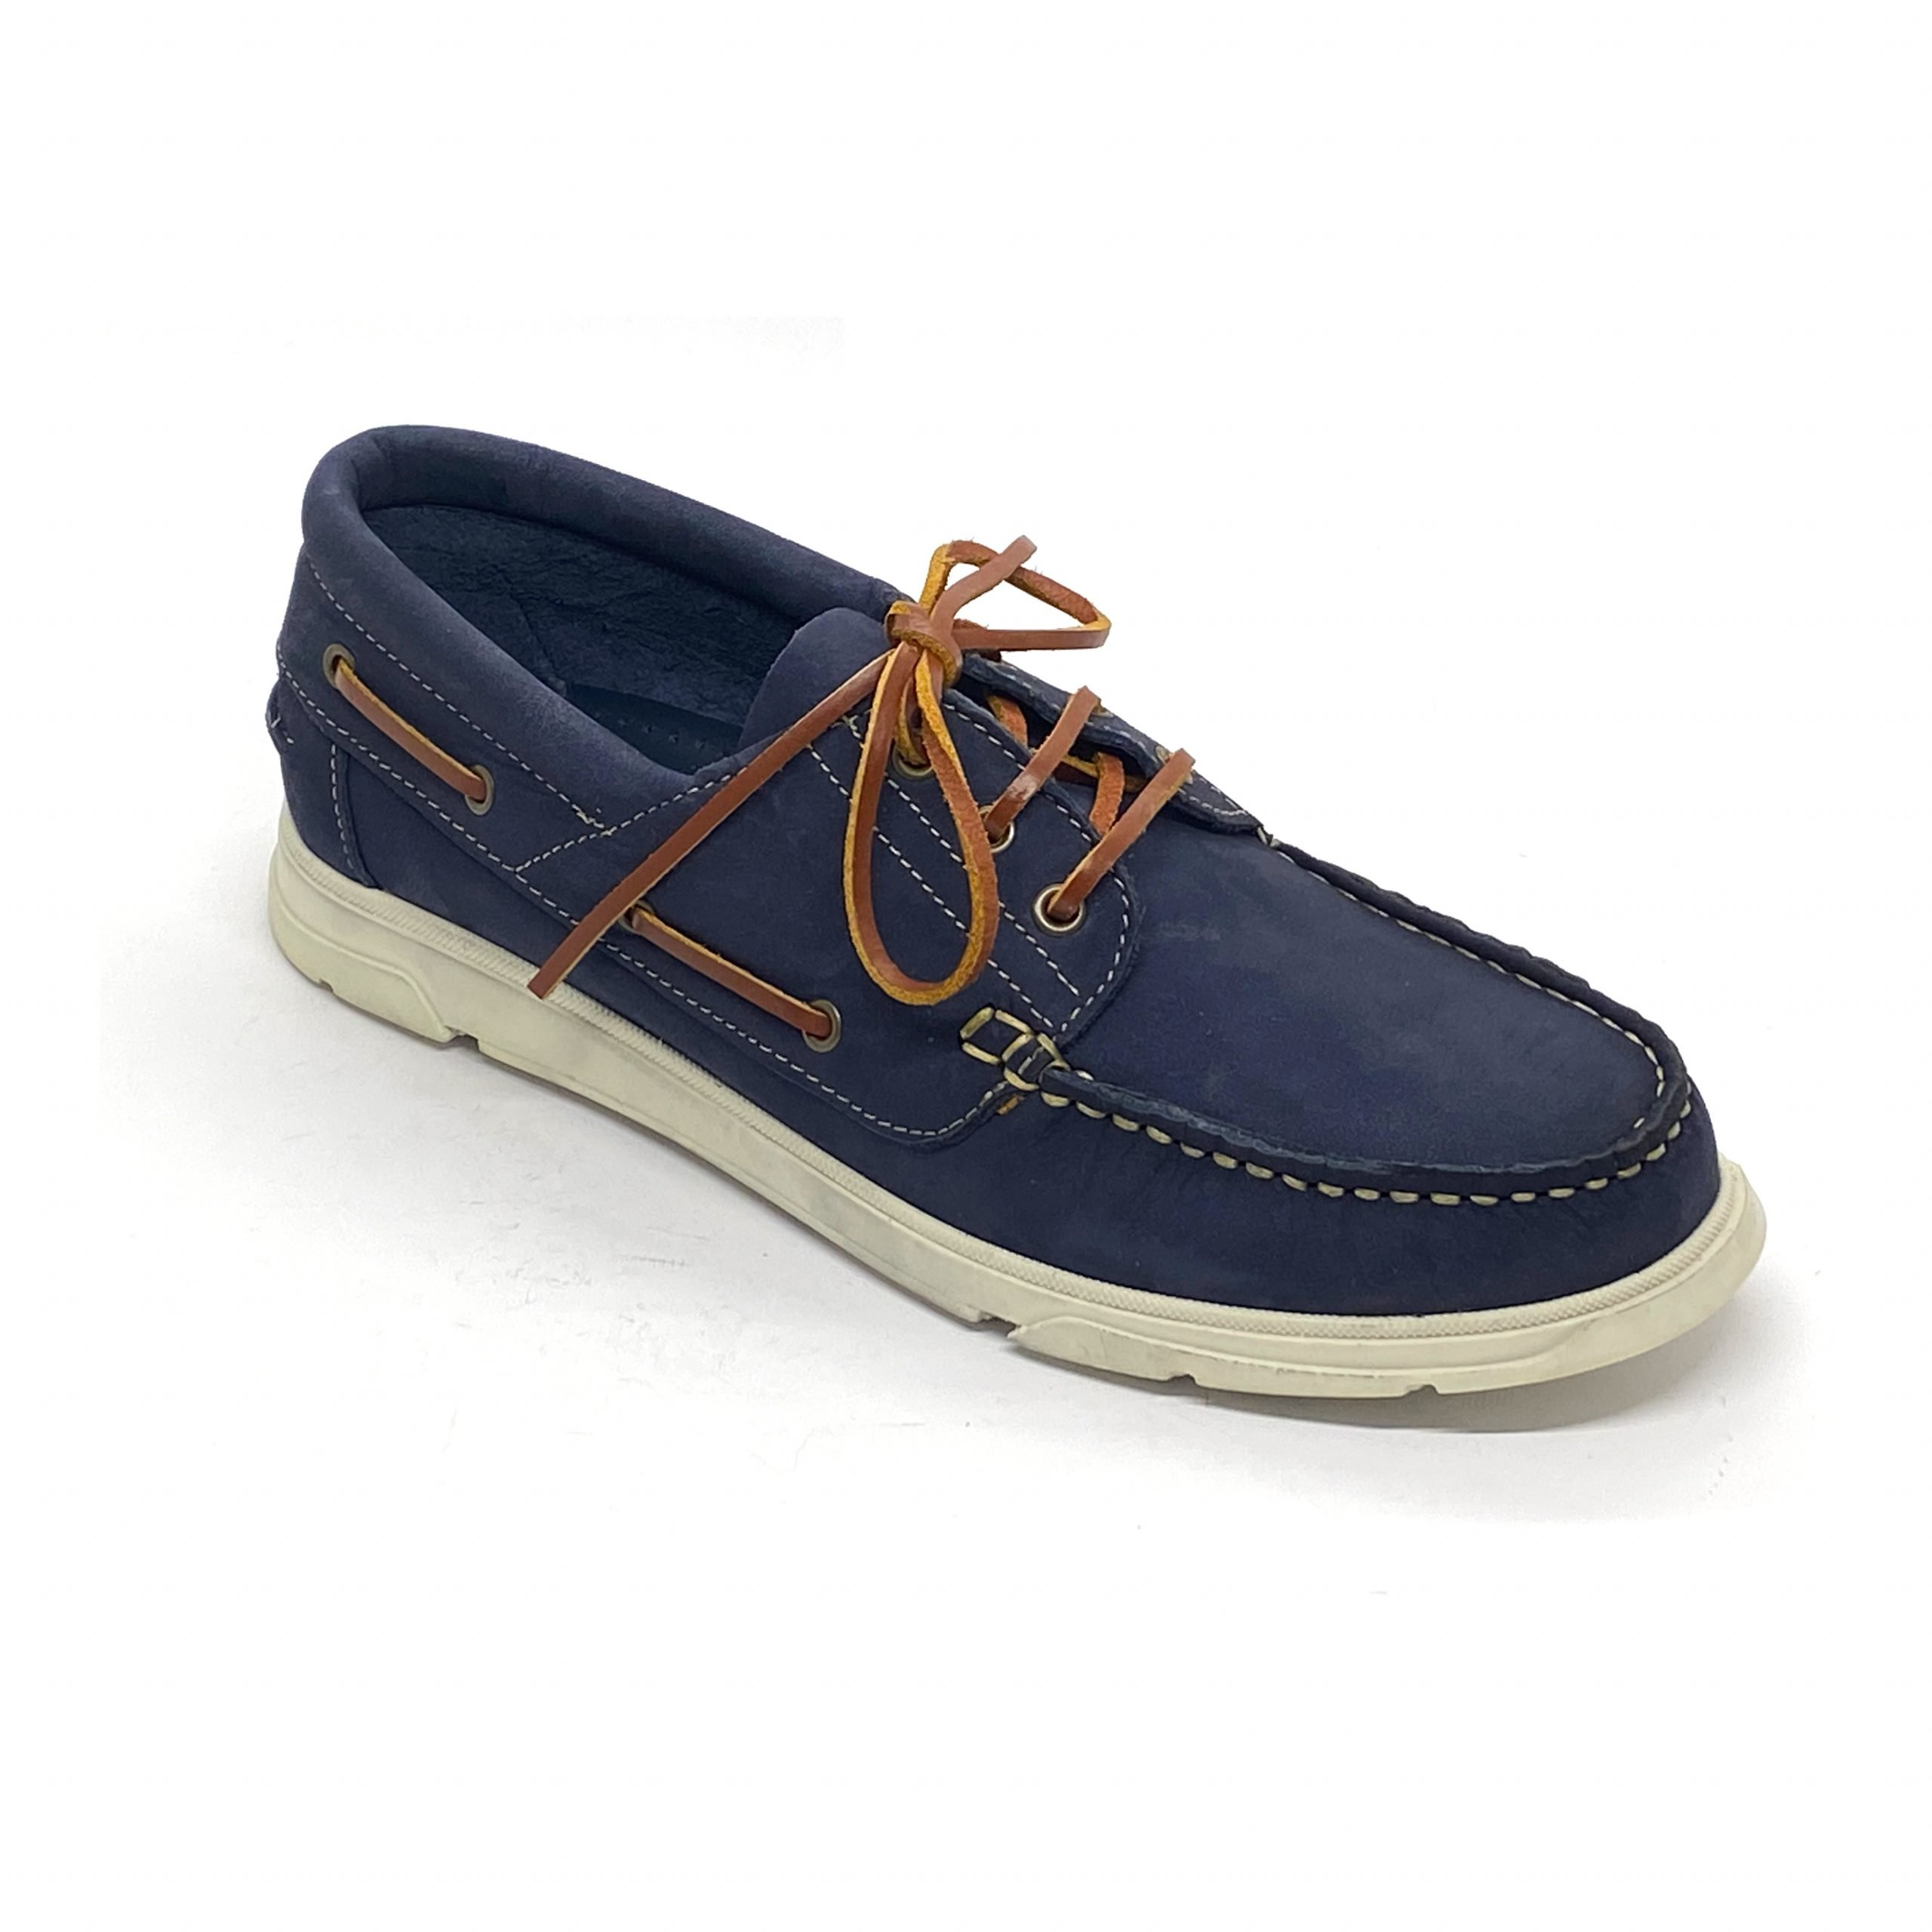 Náutico Nobuck Keelan Jeans/Taupe